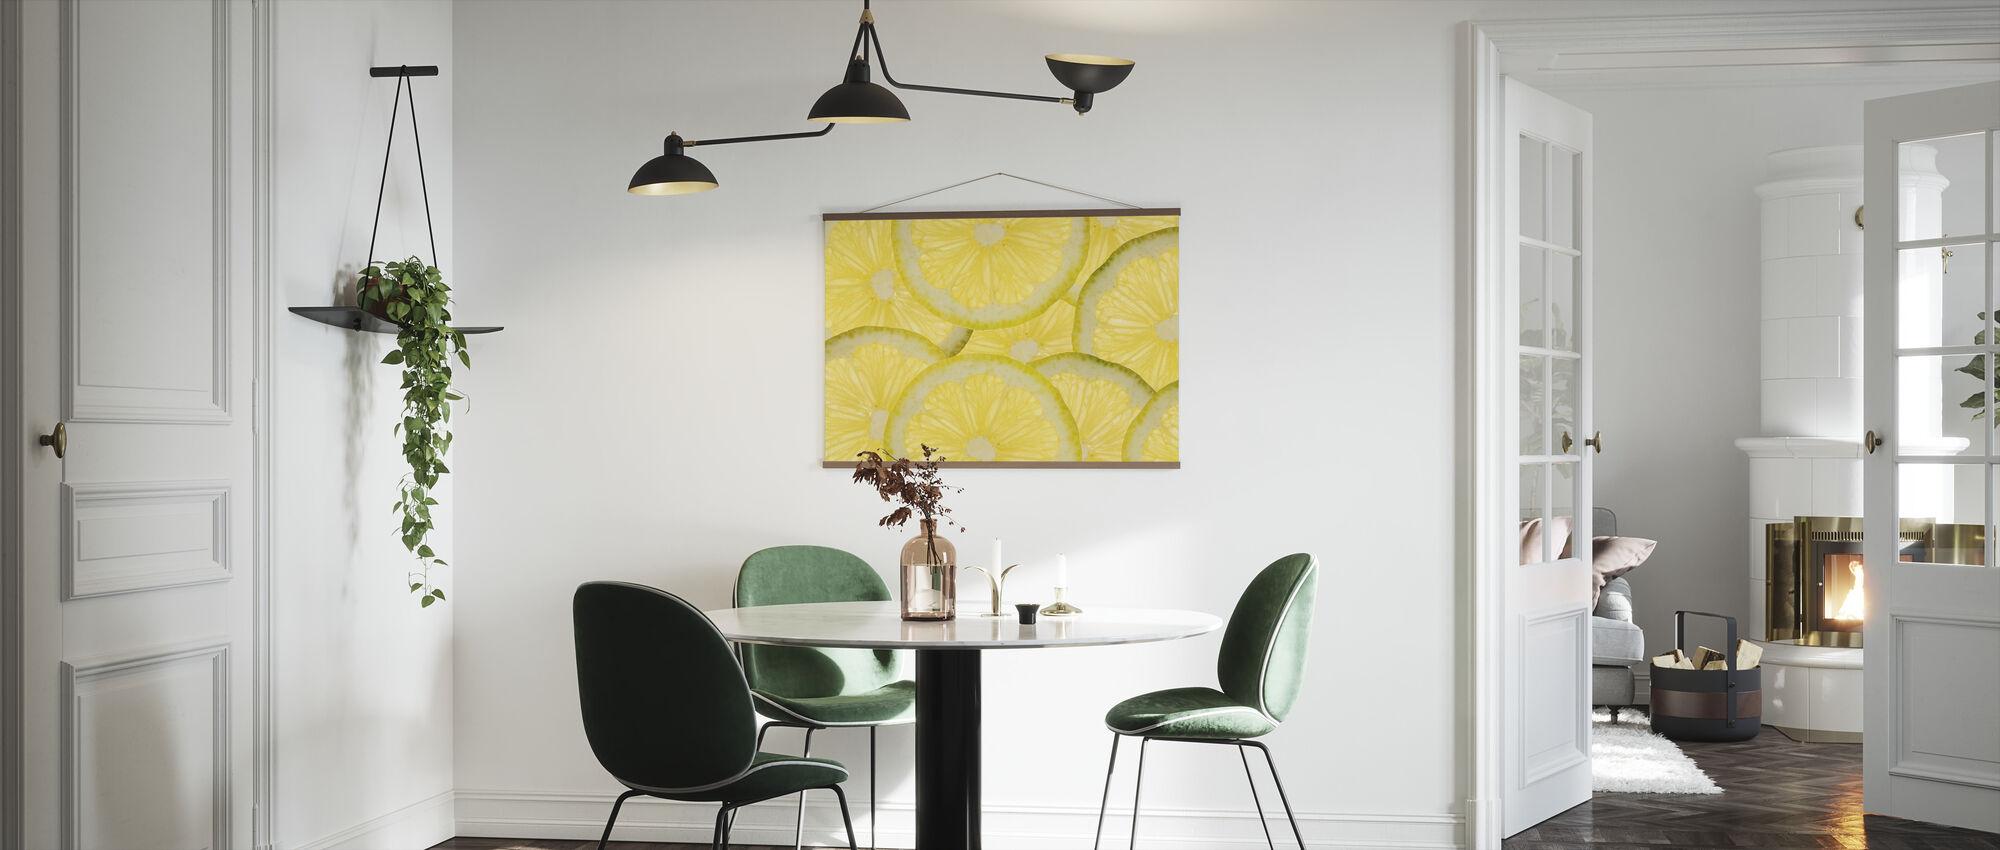 Cytryny w plasterkach - Plakat - Kuchnia